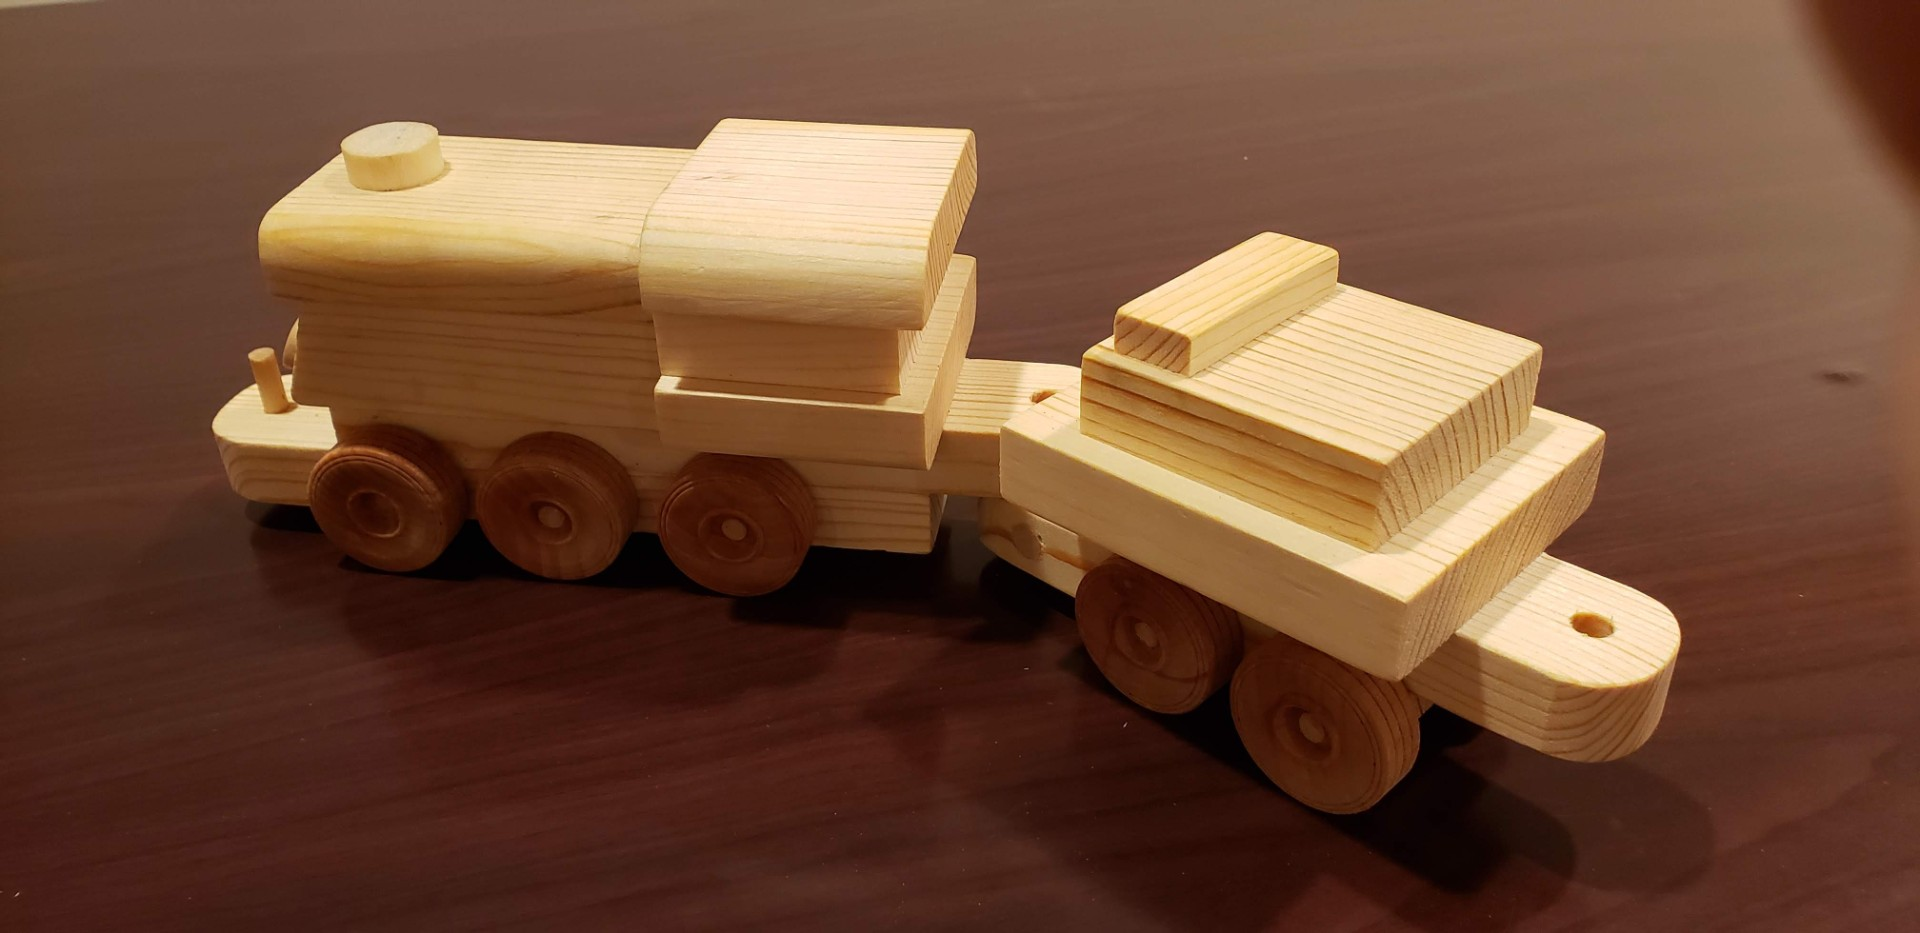 pufferbilly toy train 001.jpg